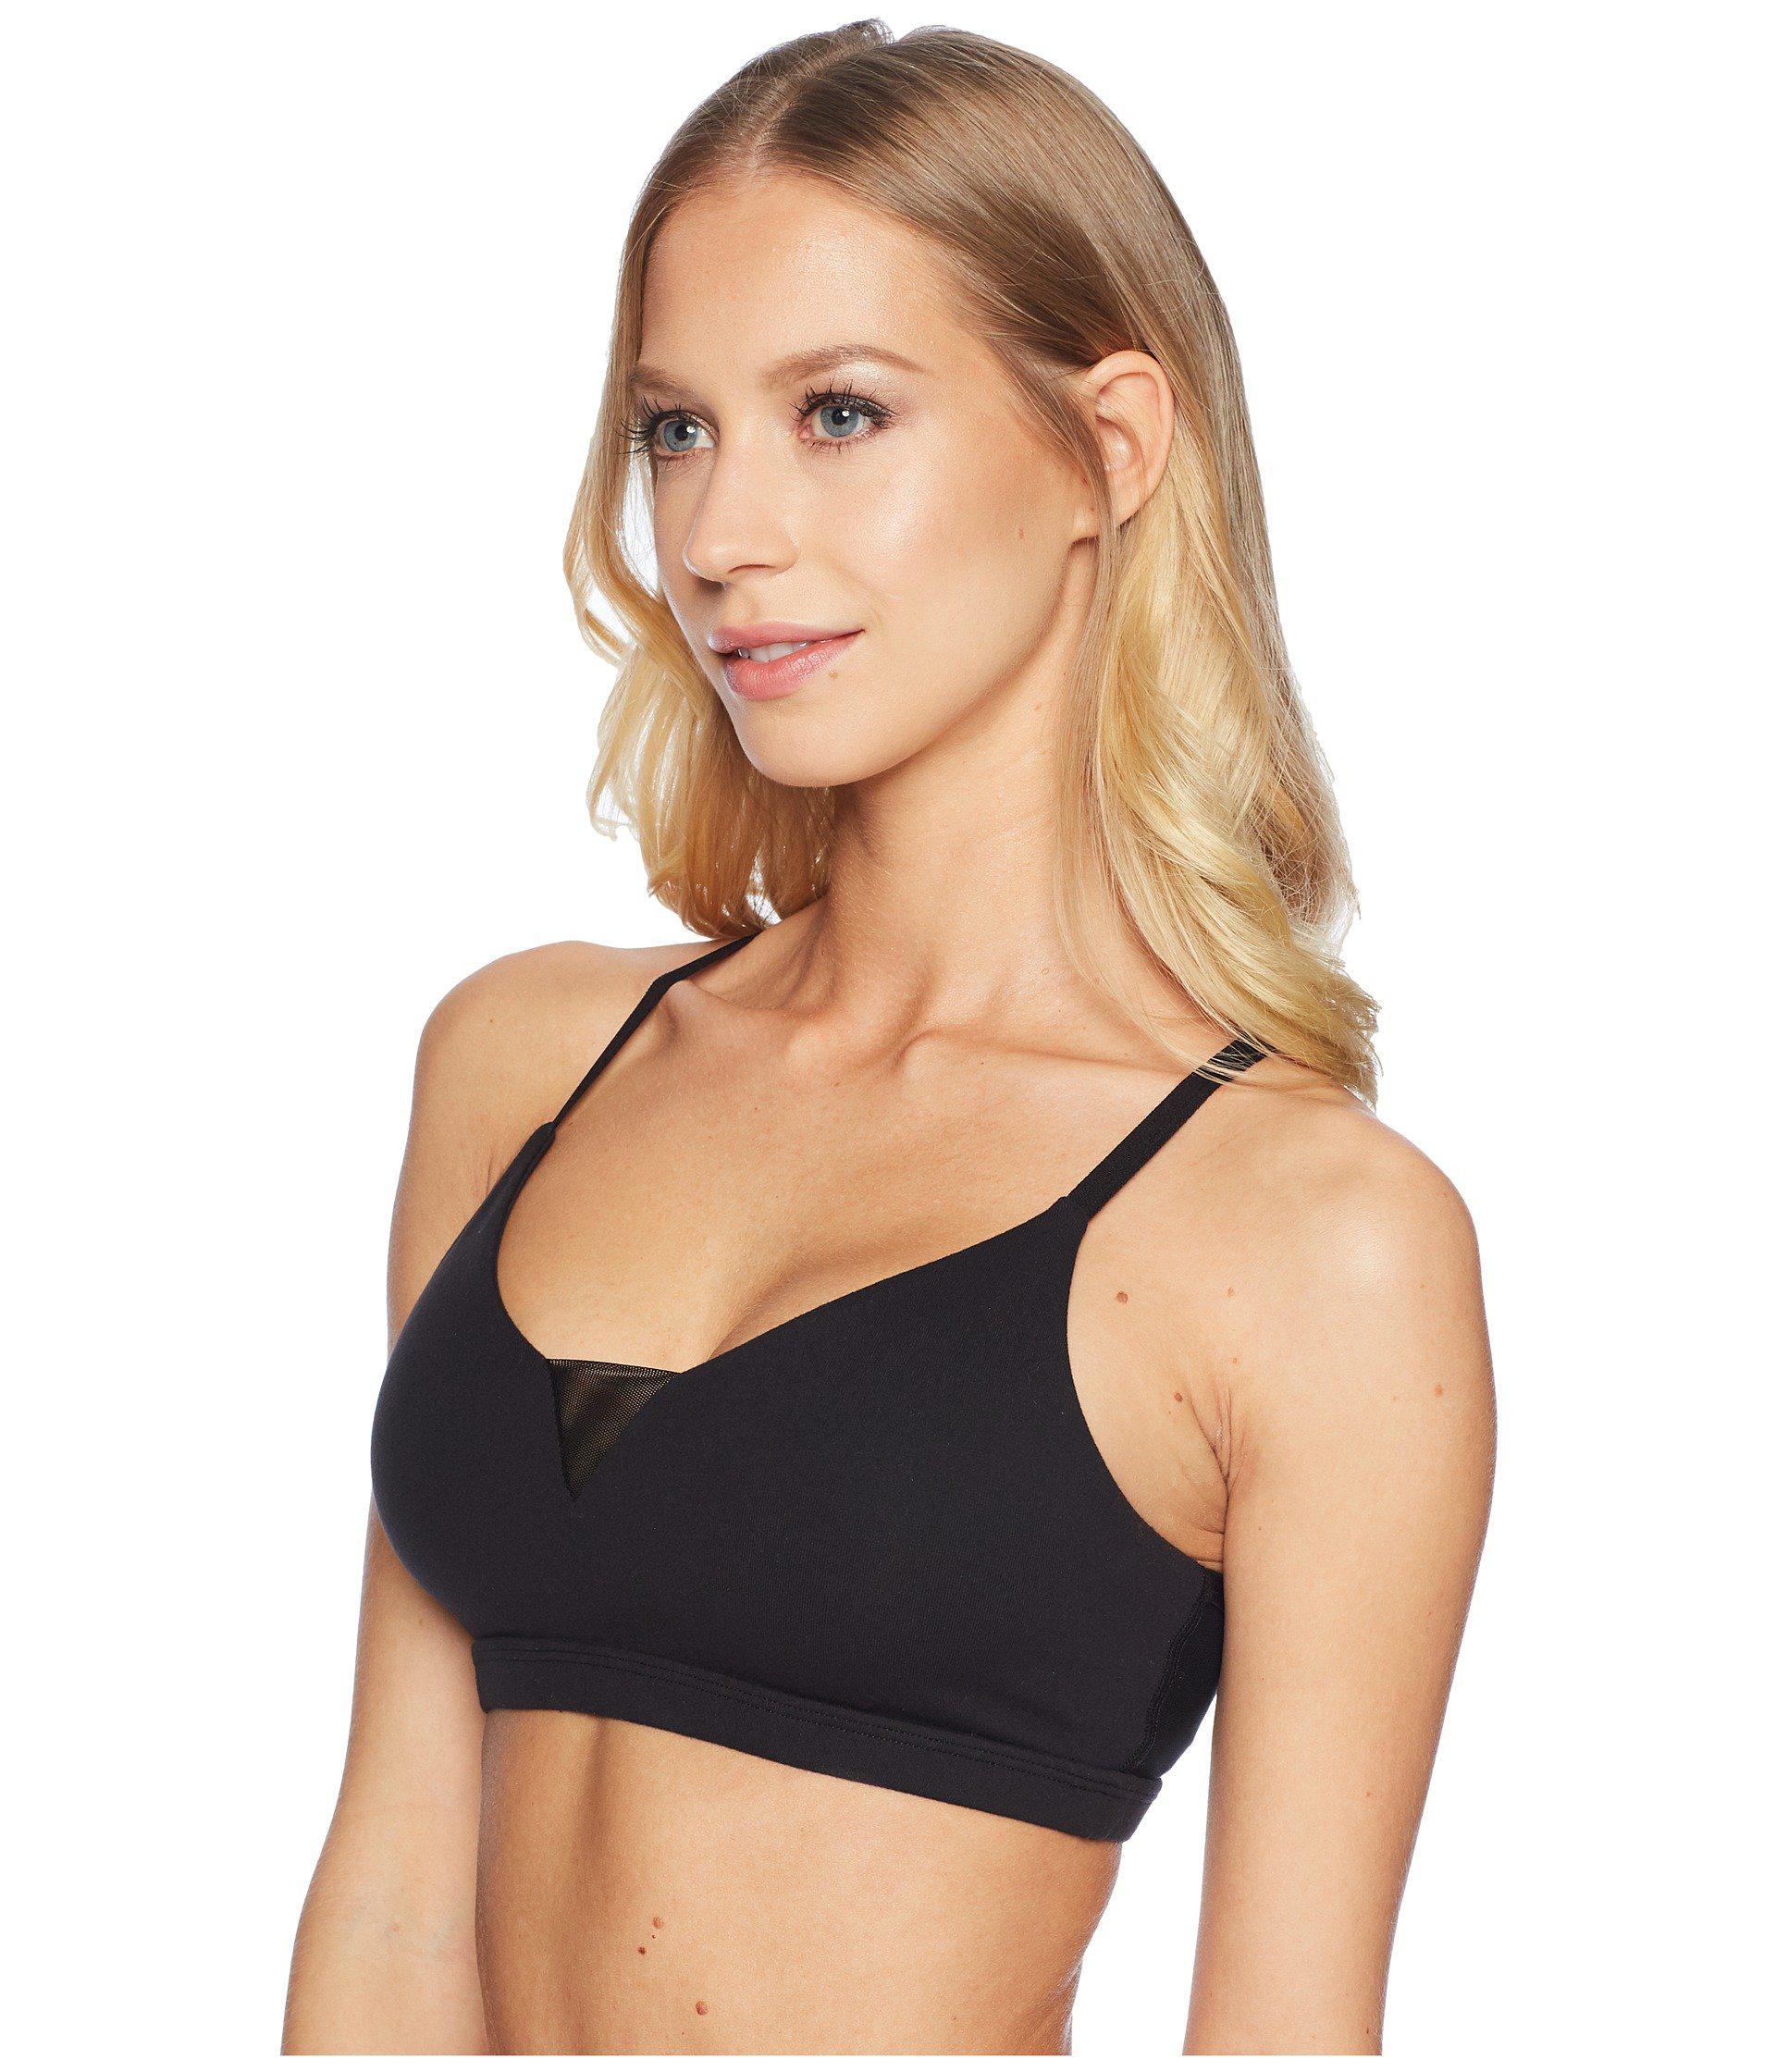 0bb3d90cedf23 Lyst - Beyond Yoga Double Up Bra (jet Black) Women s Bra in Black